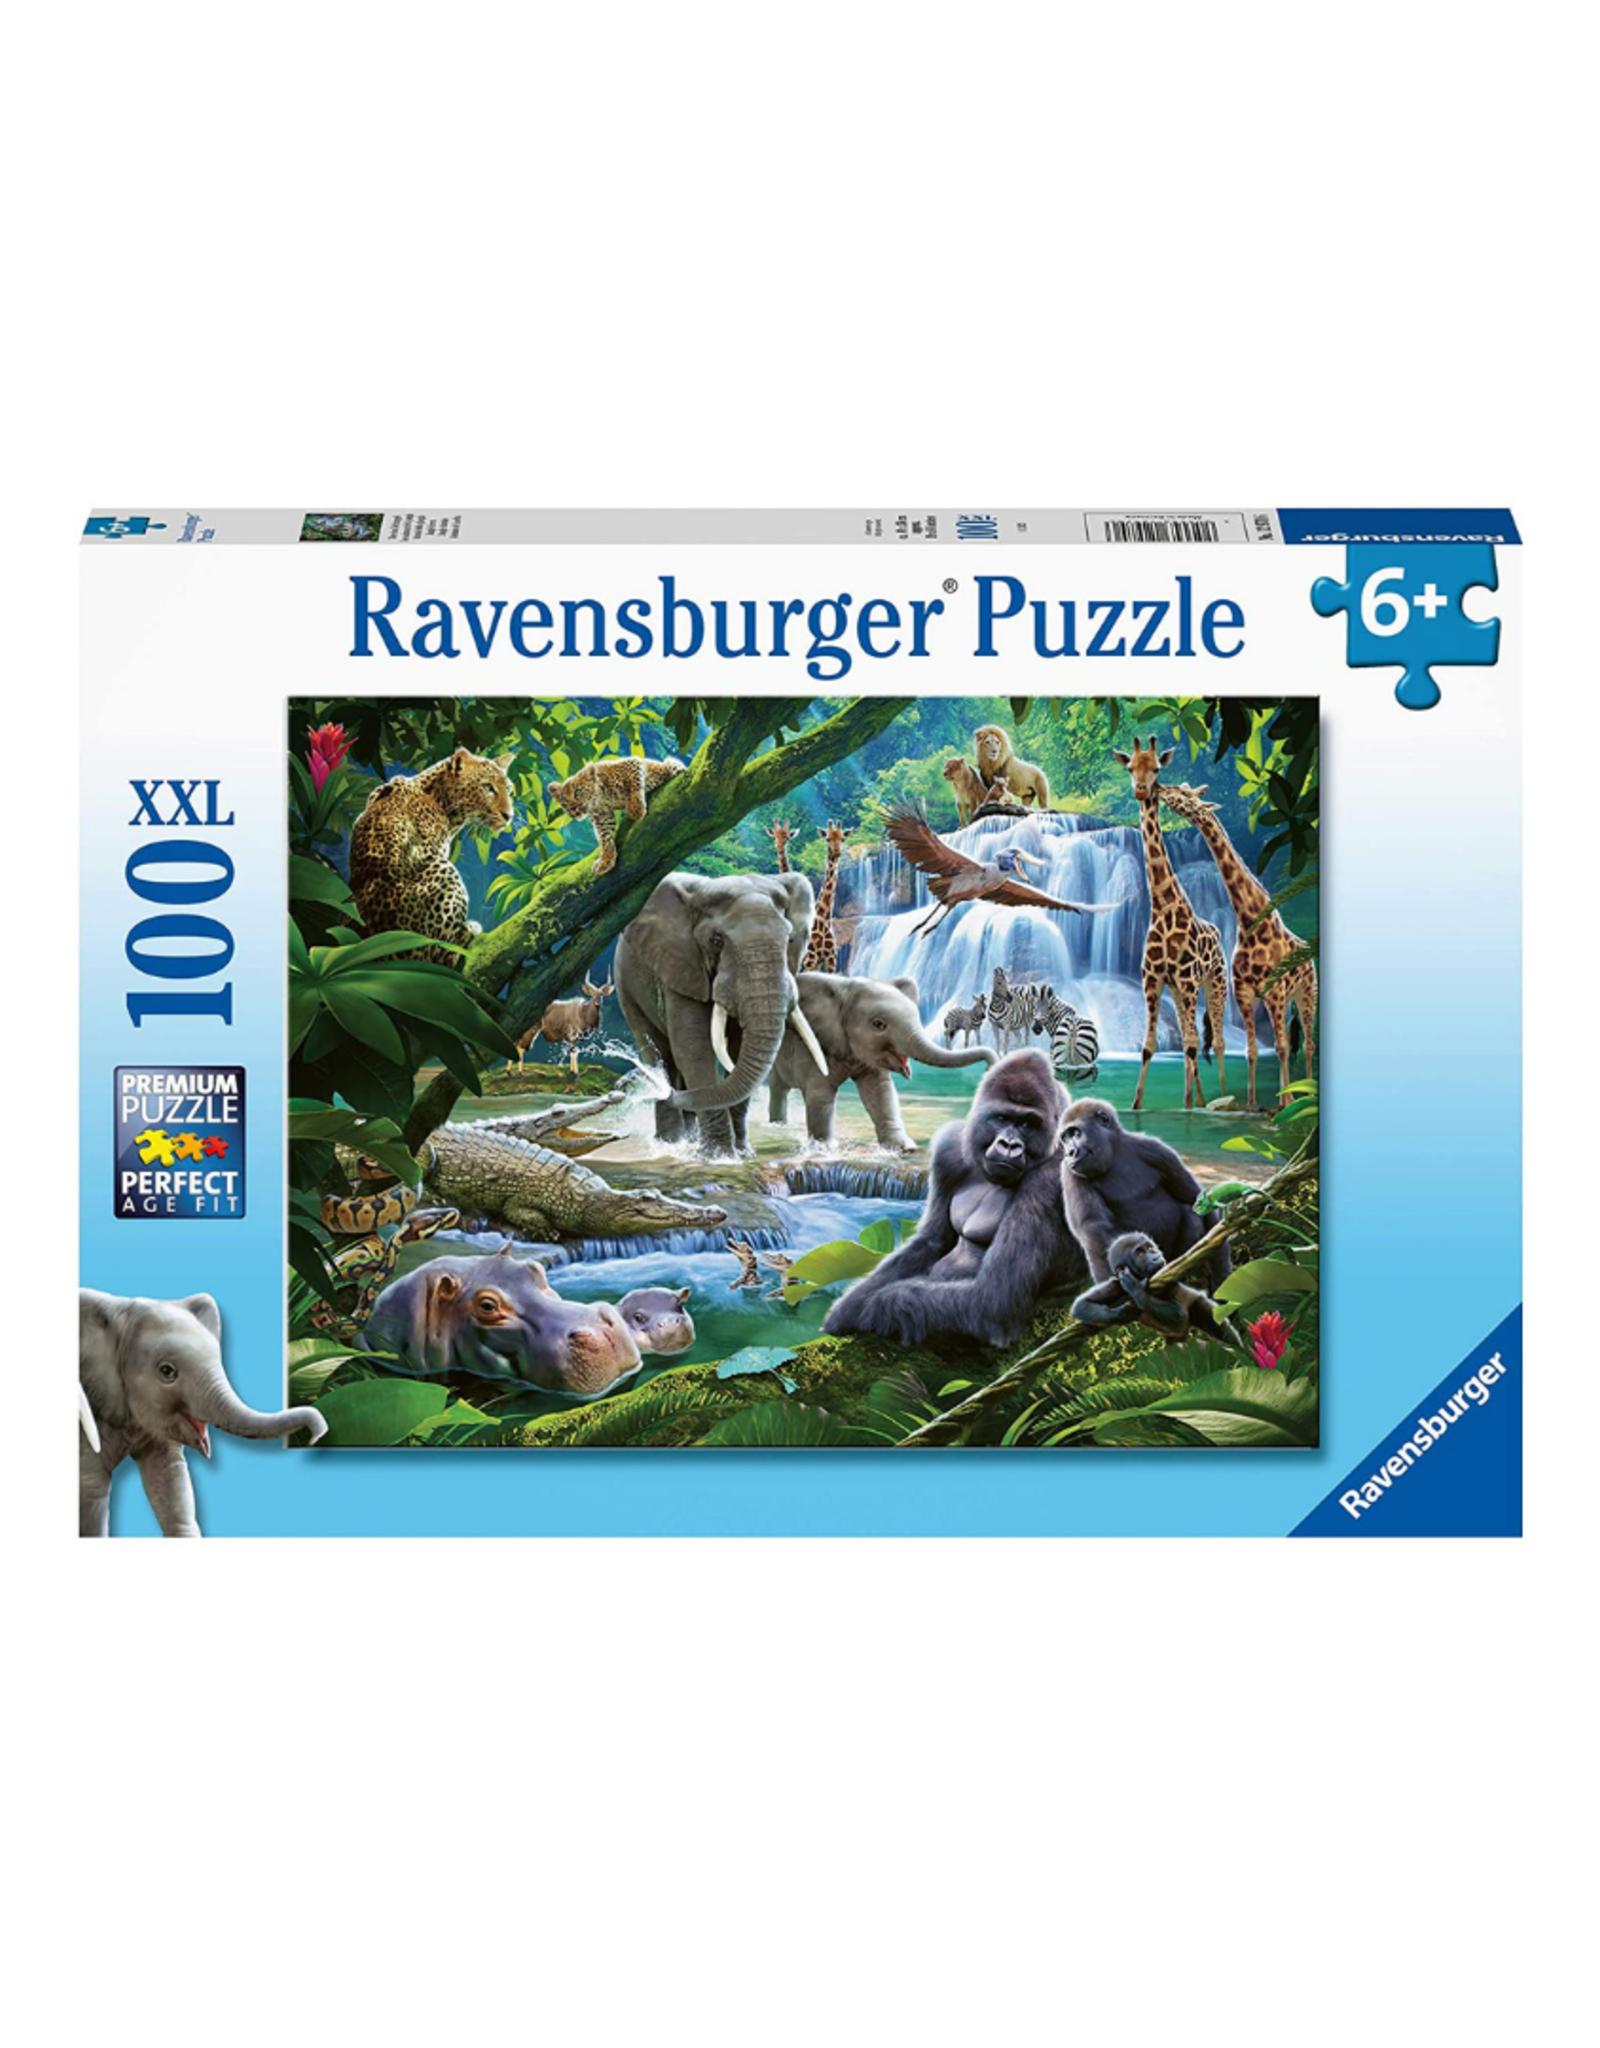 Ravensburger Jungle Animals 100pc Puzzle